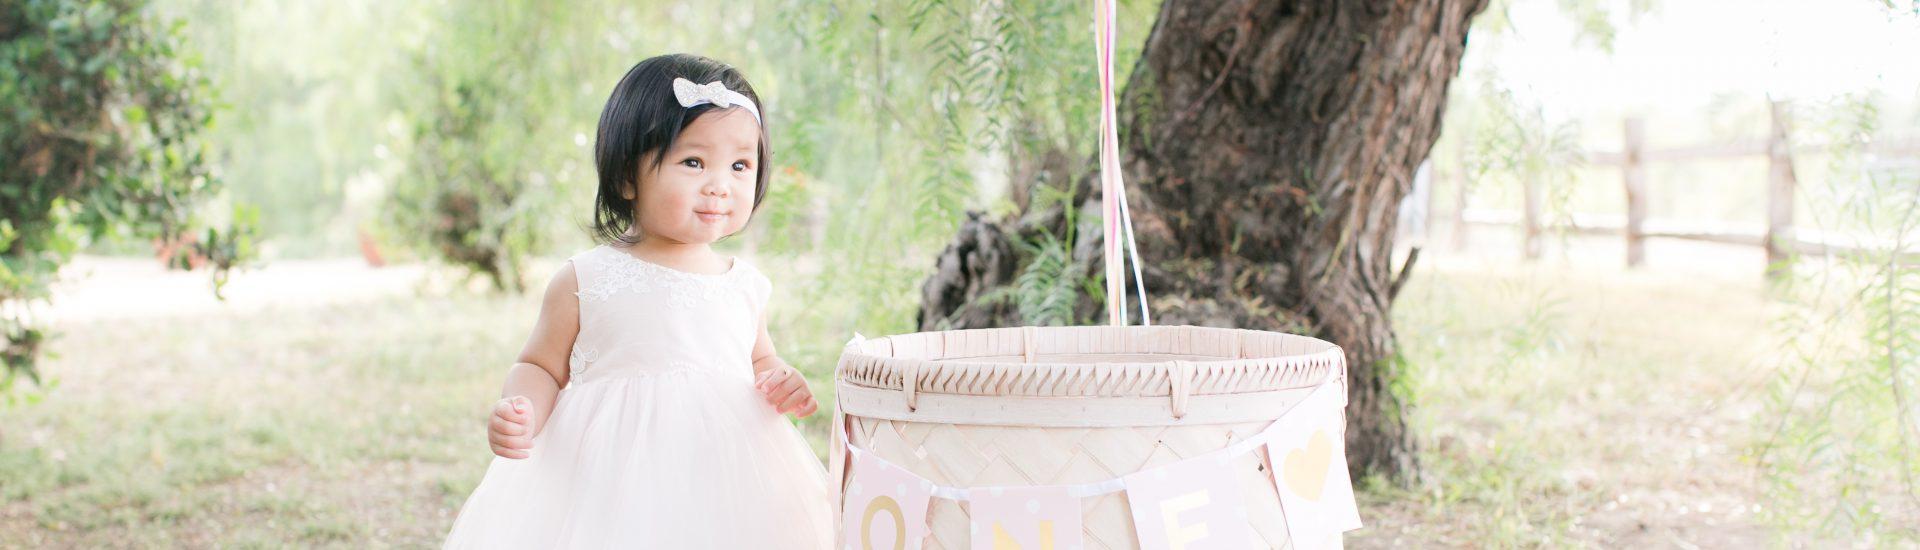 NEMA Photography J.Pham049 1920x550 - Baby Justine // One year old portraits